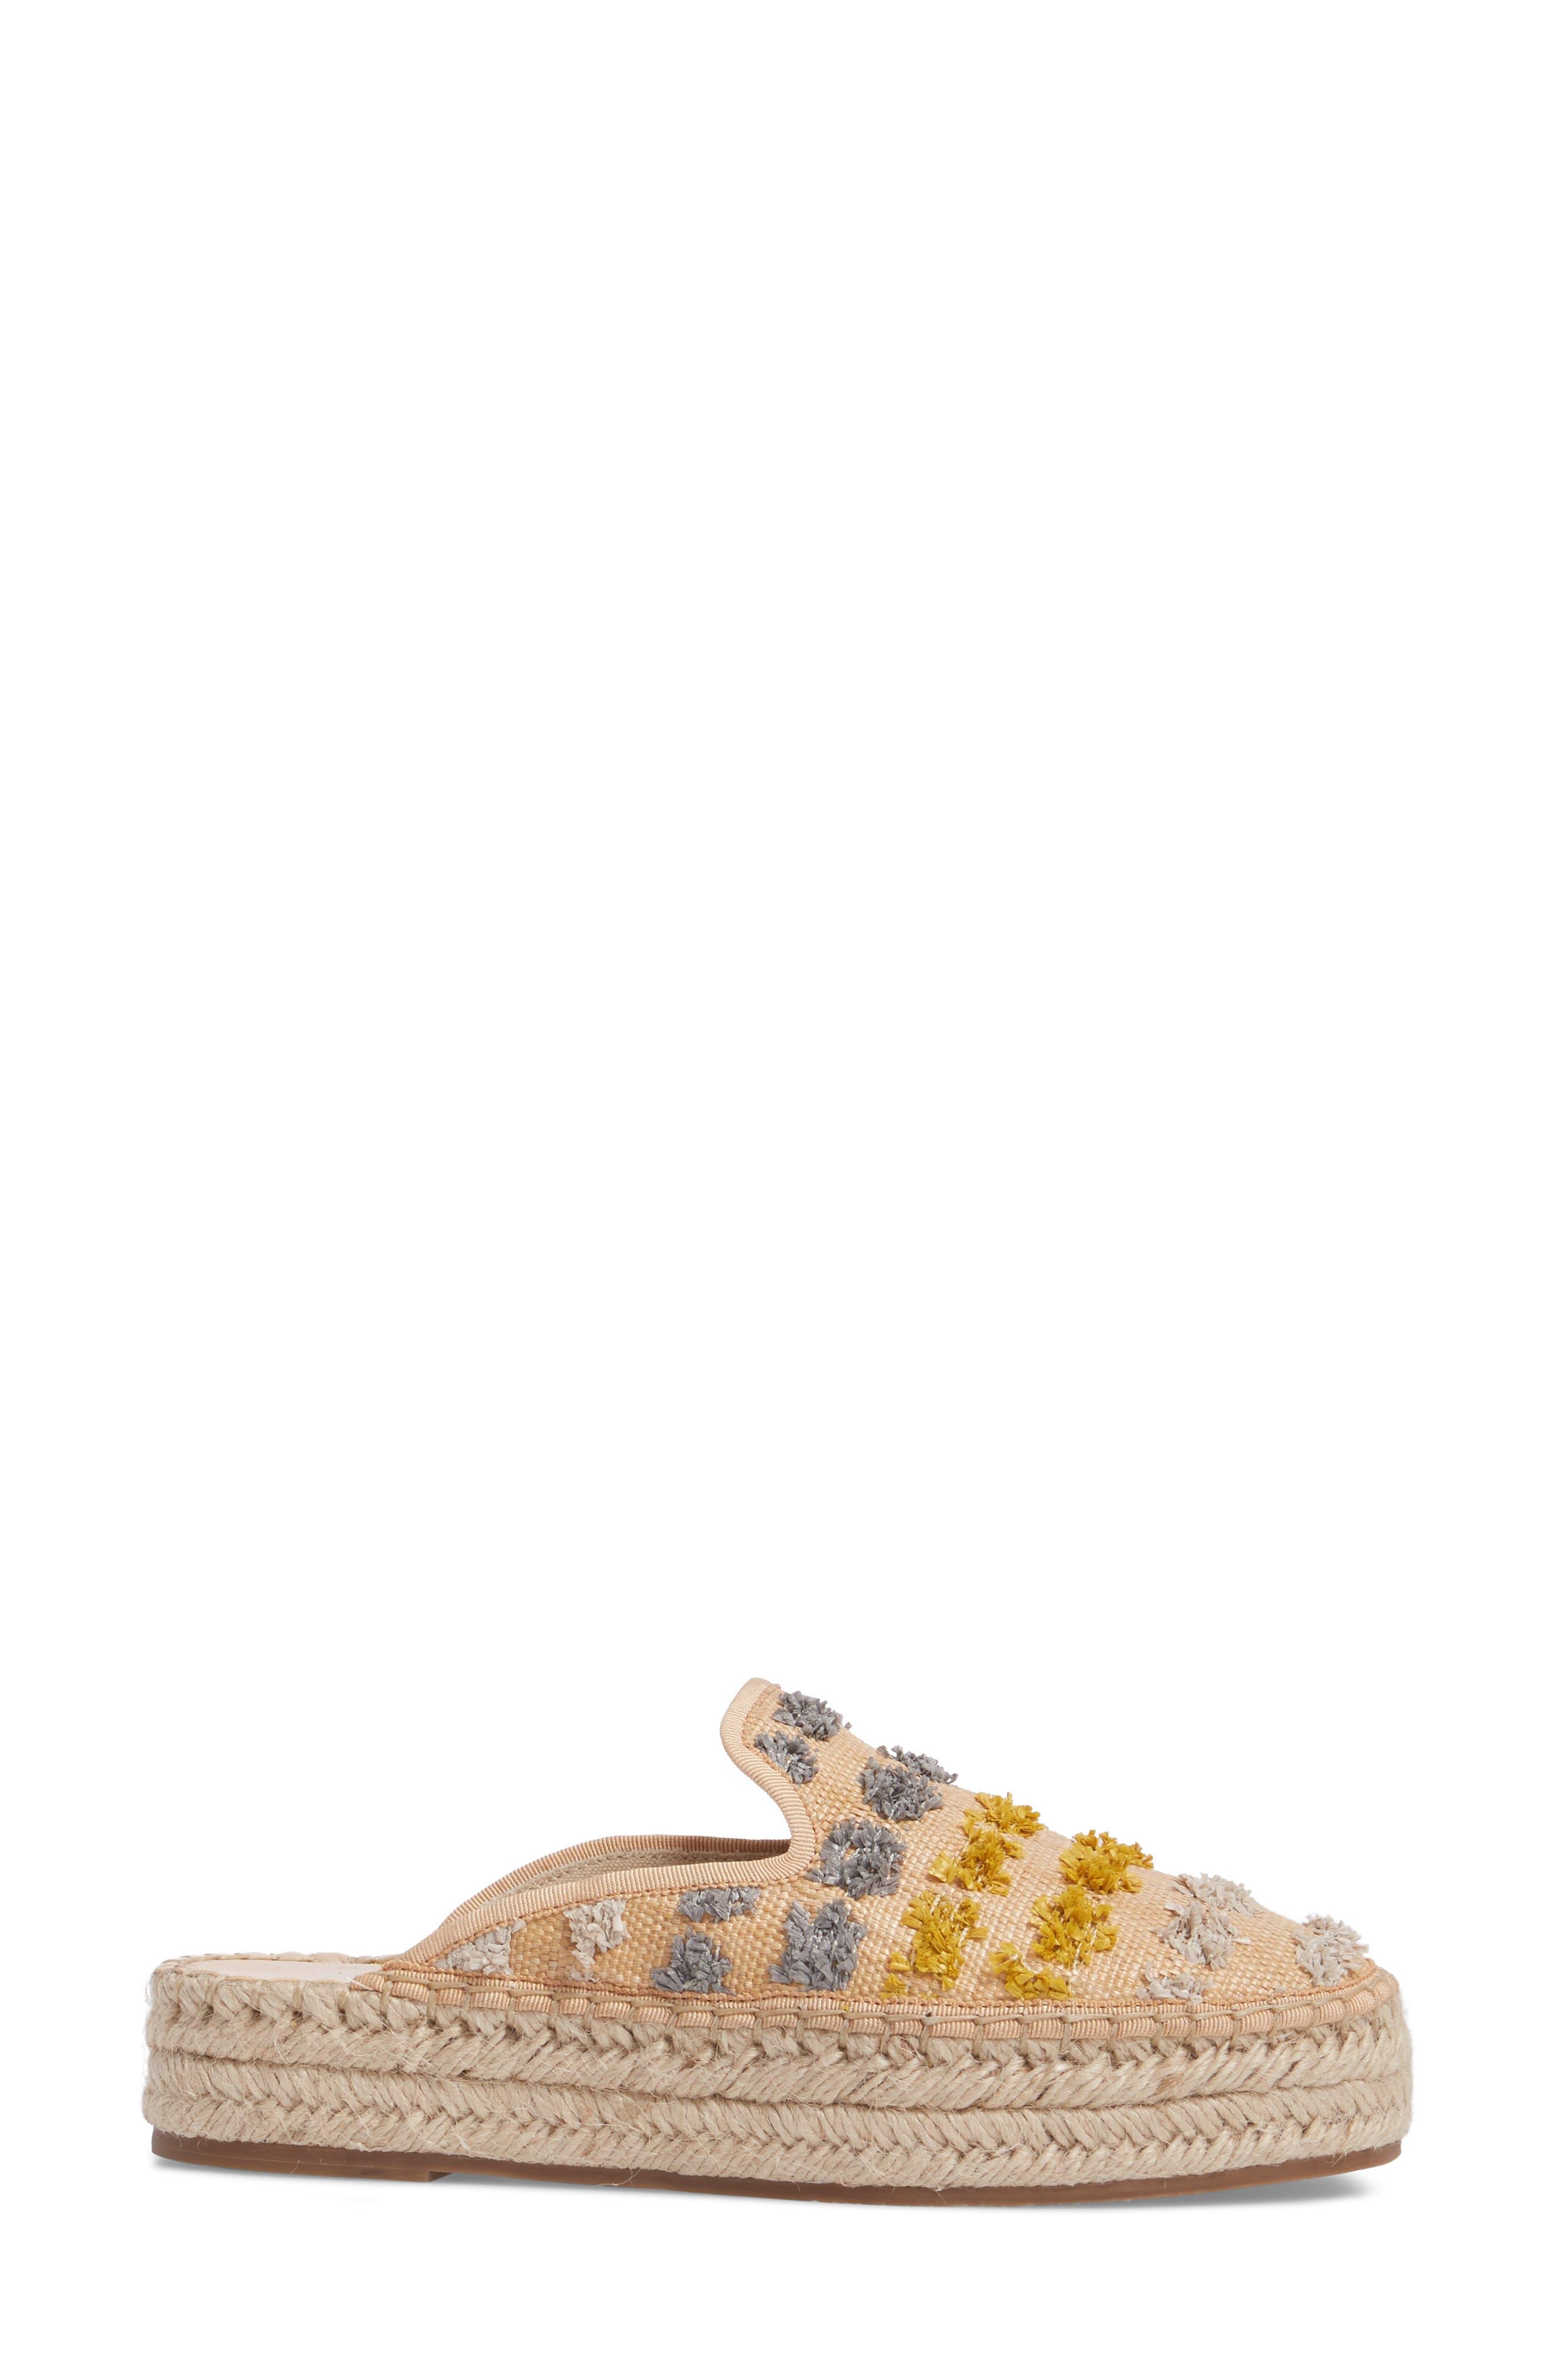 TREASURE & BOND,                             Marlowe Tufted Espadrille Loafer Mule,                             Alternate thumbnail 3, color,                             026